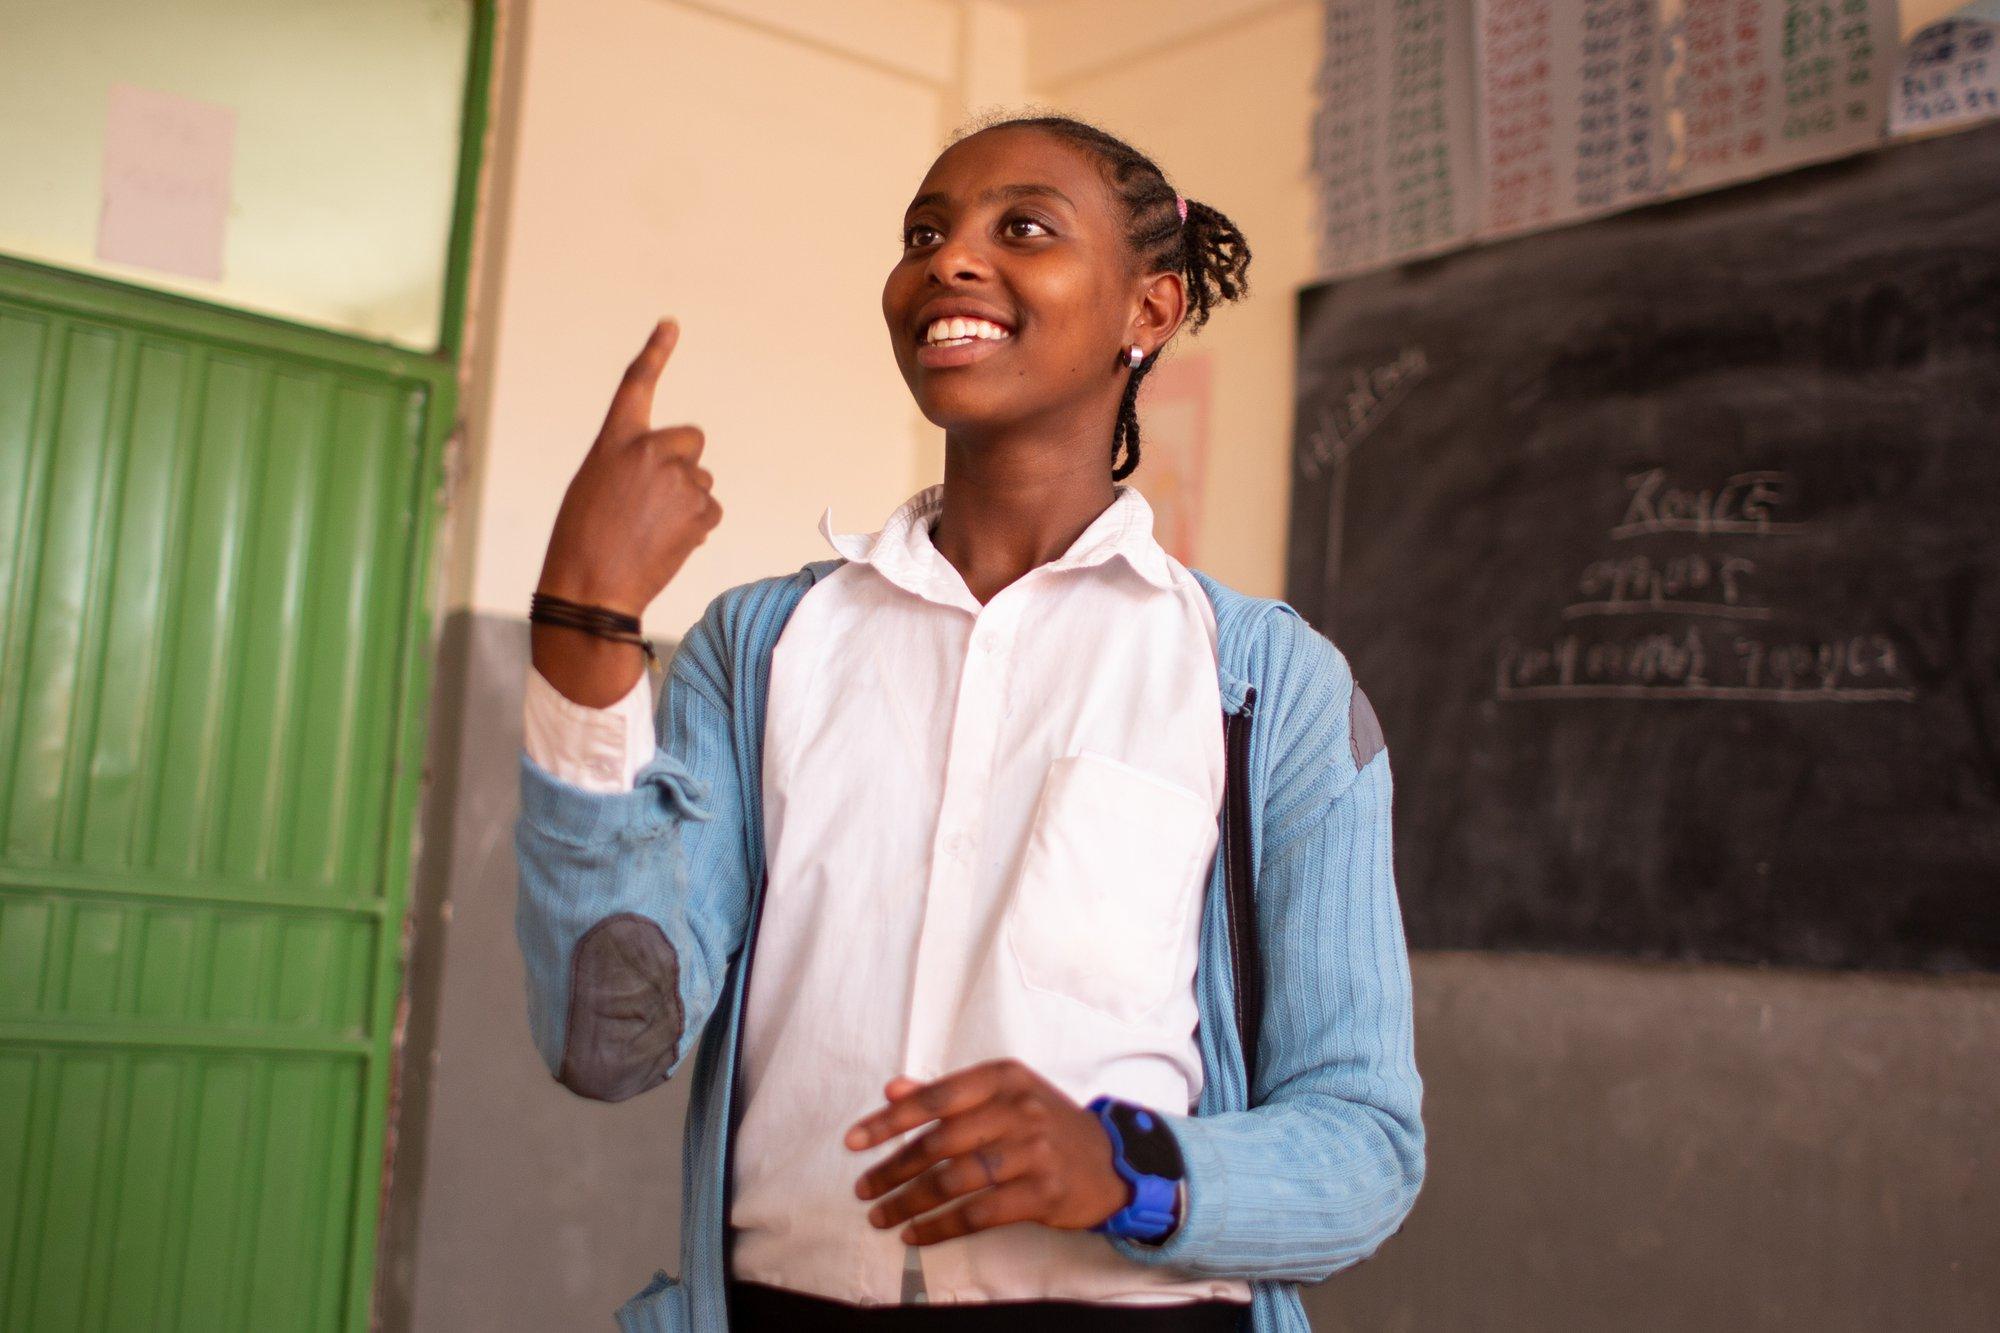 Photo – Ethiopia – 2019 _– Ife 16 – Individual.jpg